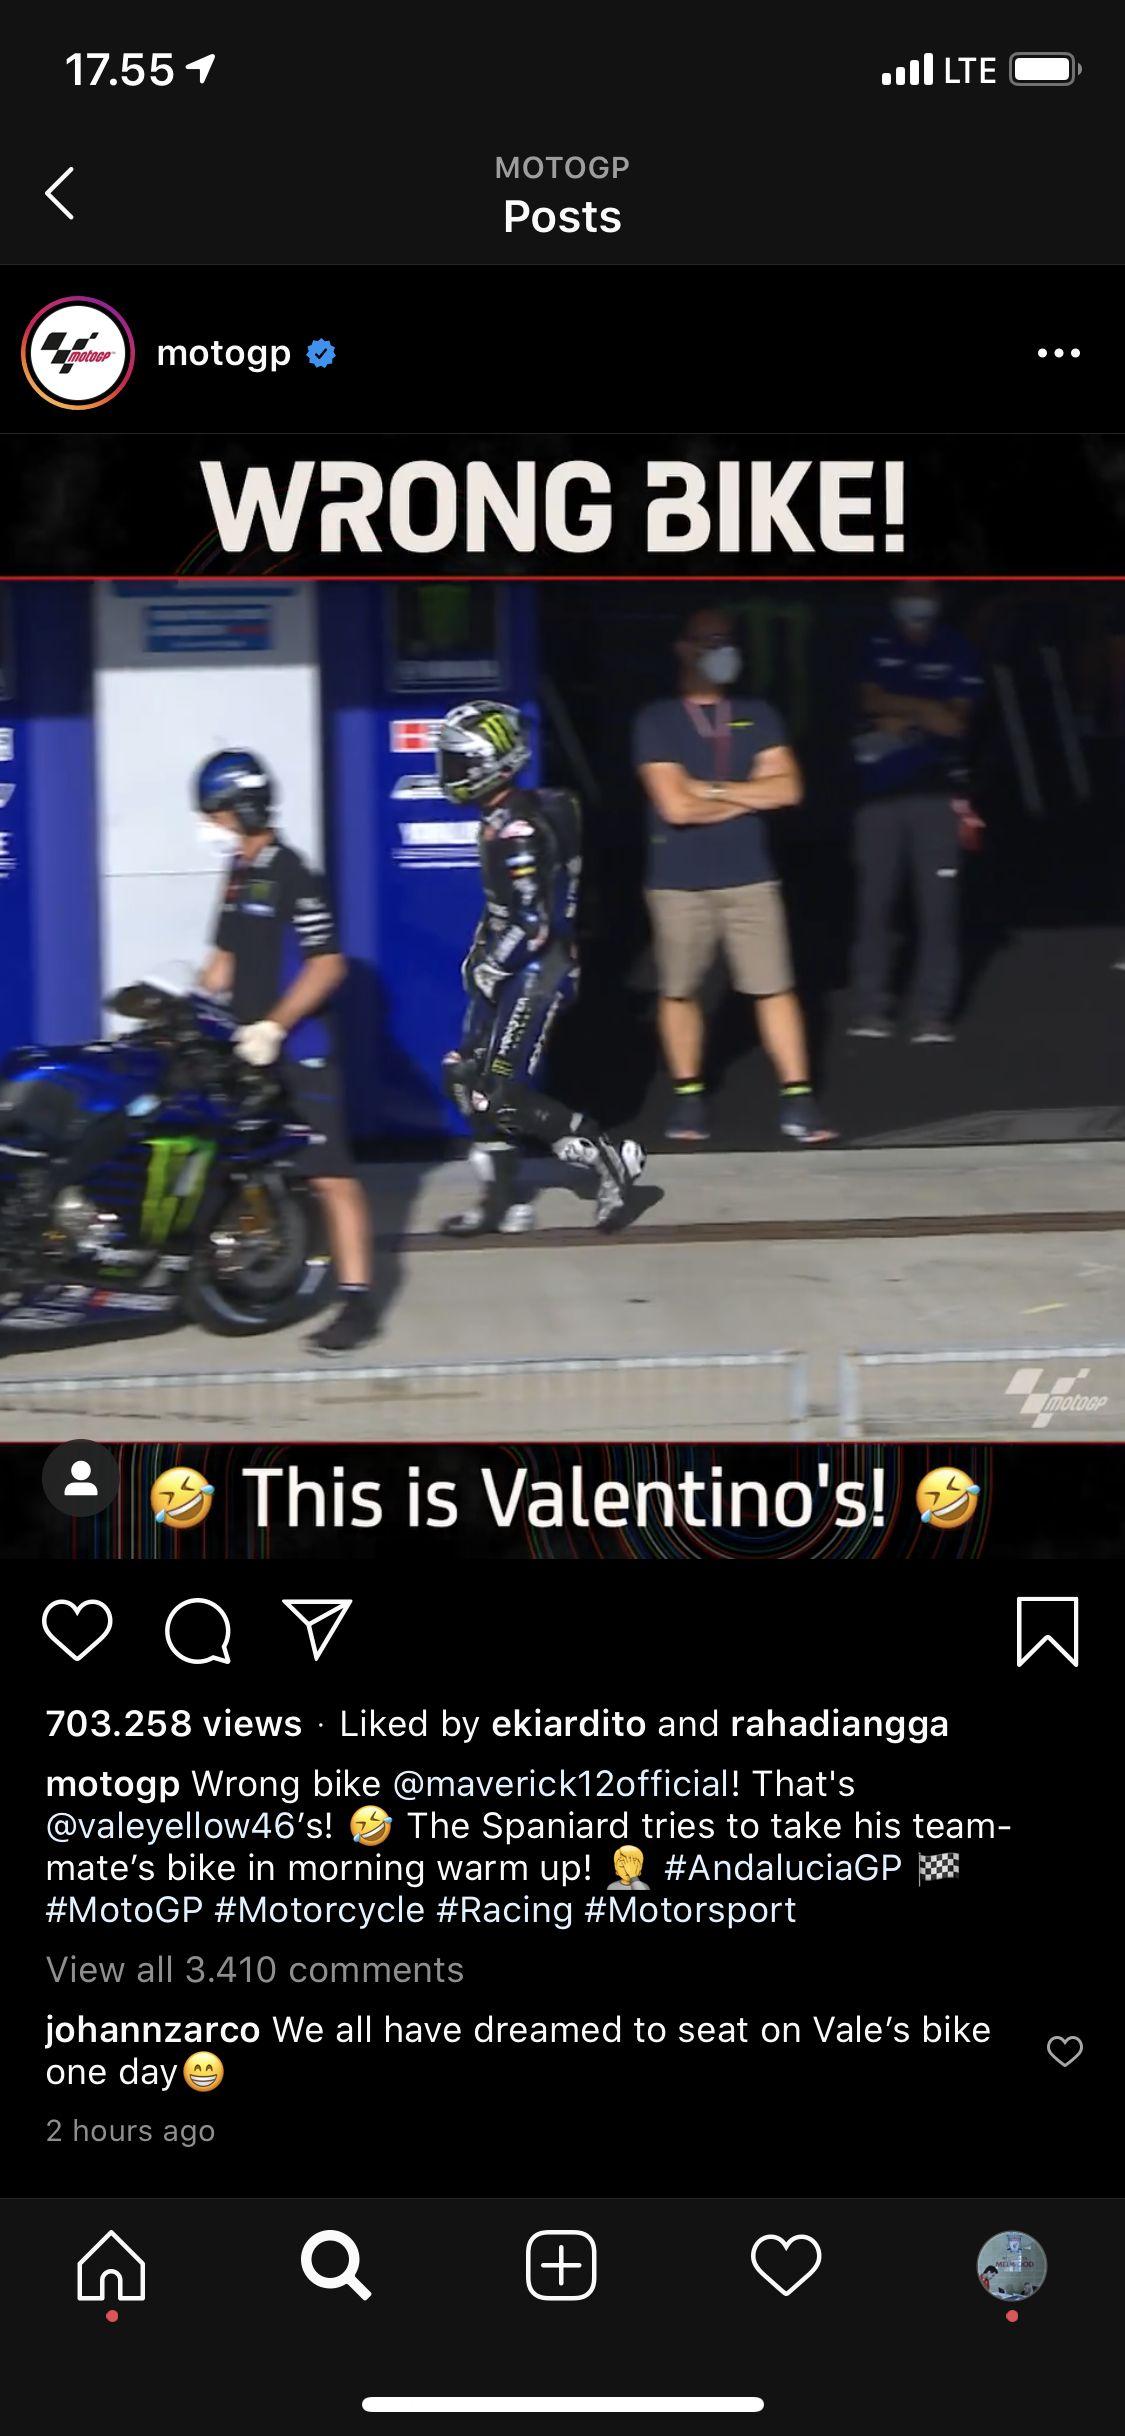 MotoGP rider Maverick Vinales of Spain celebrates his second place at the podium of the Spanish Motorcycle Grand Prix at the Angel Nieto racetrack in Jerez de la Frontera, Spain, Sunday, July 19, 2020. (AP Photo/David Clares)